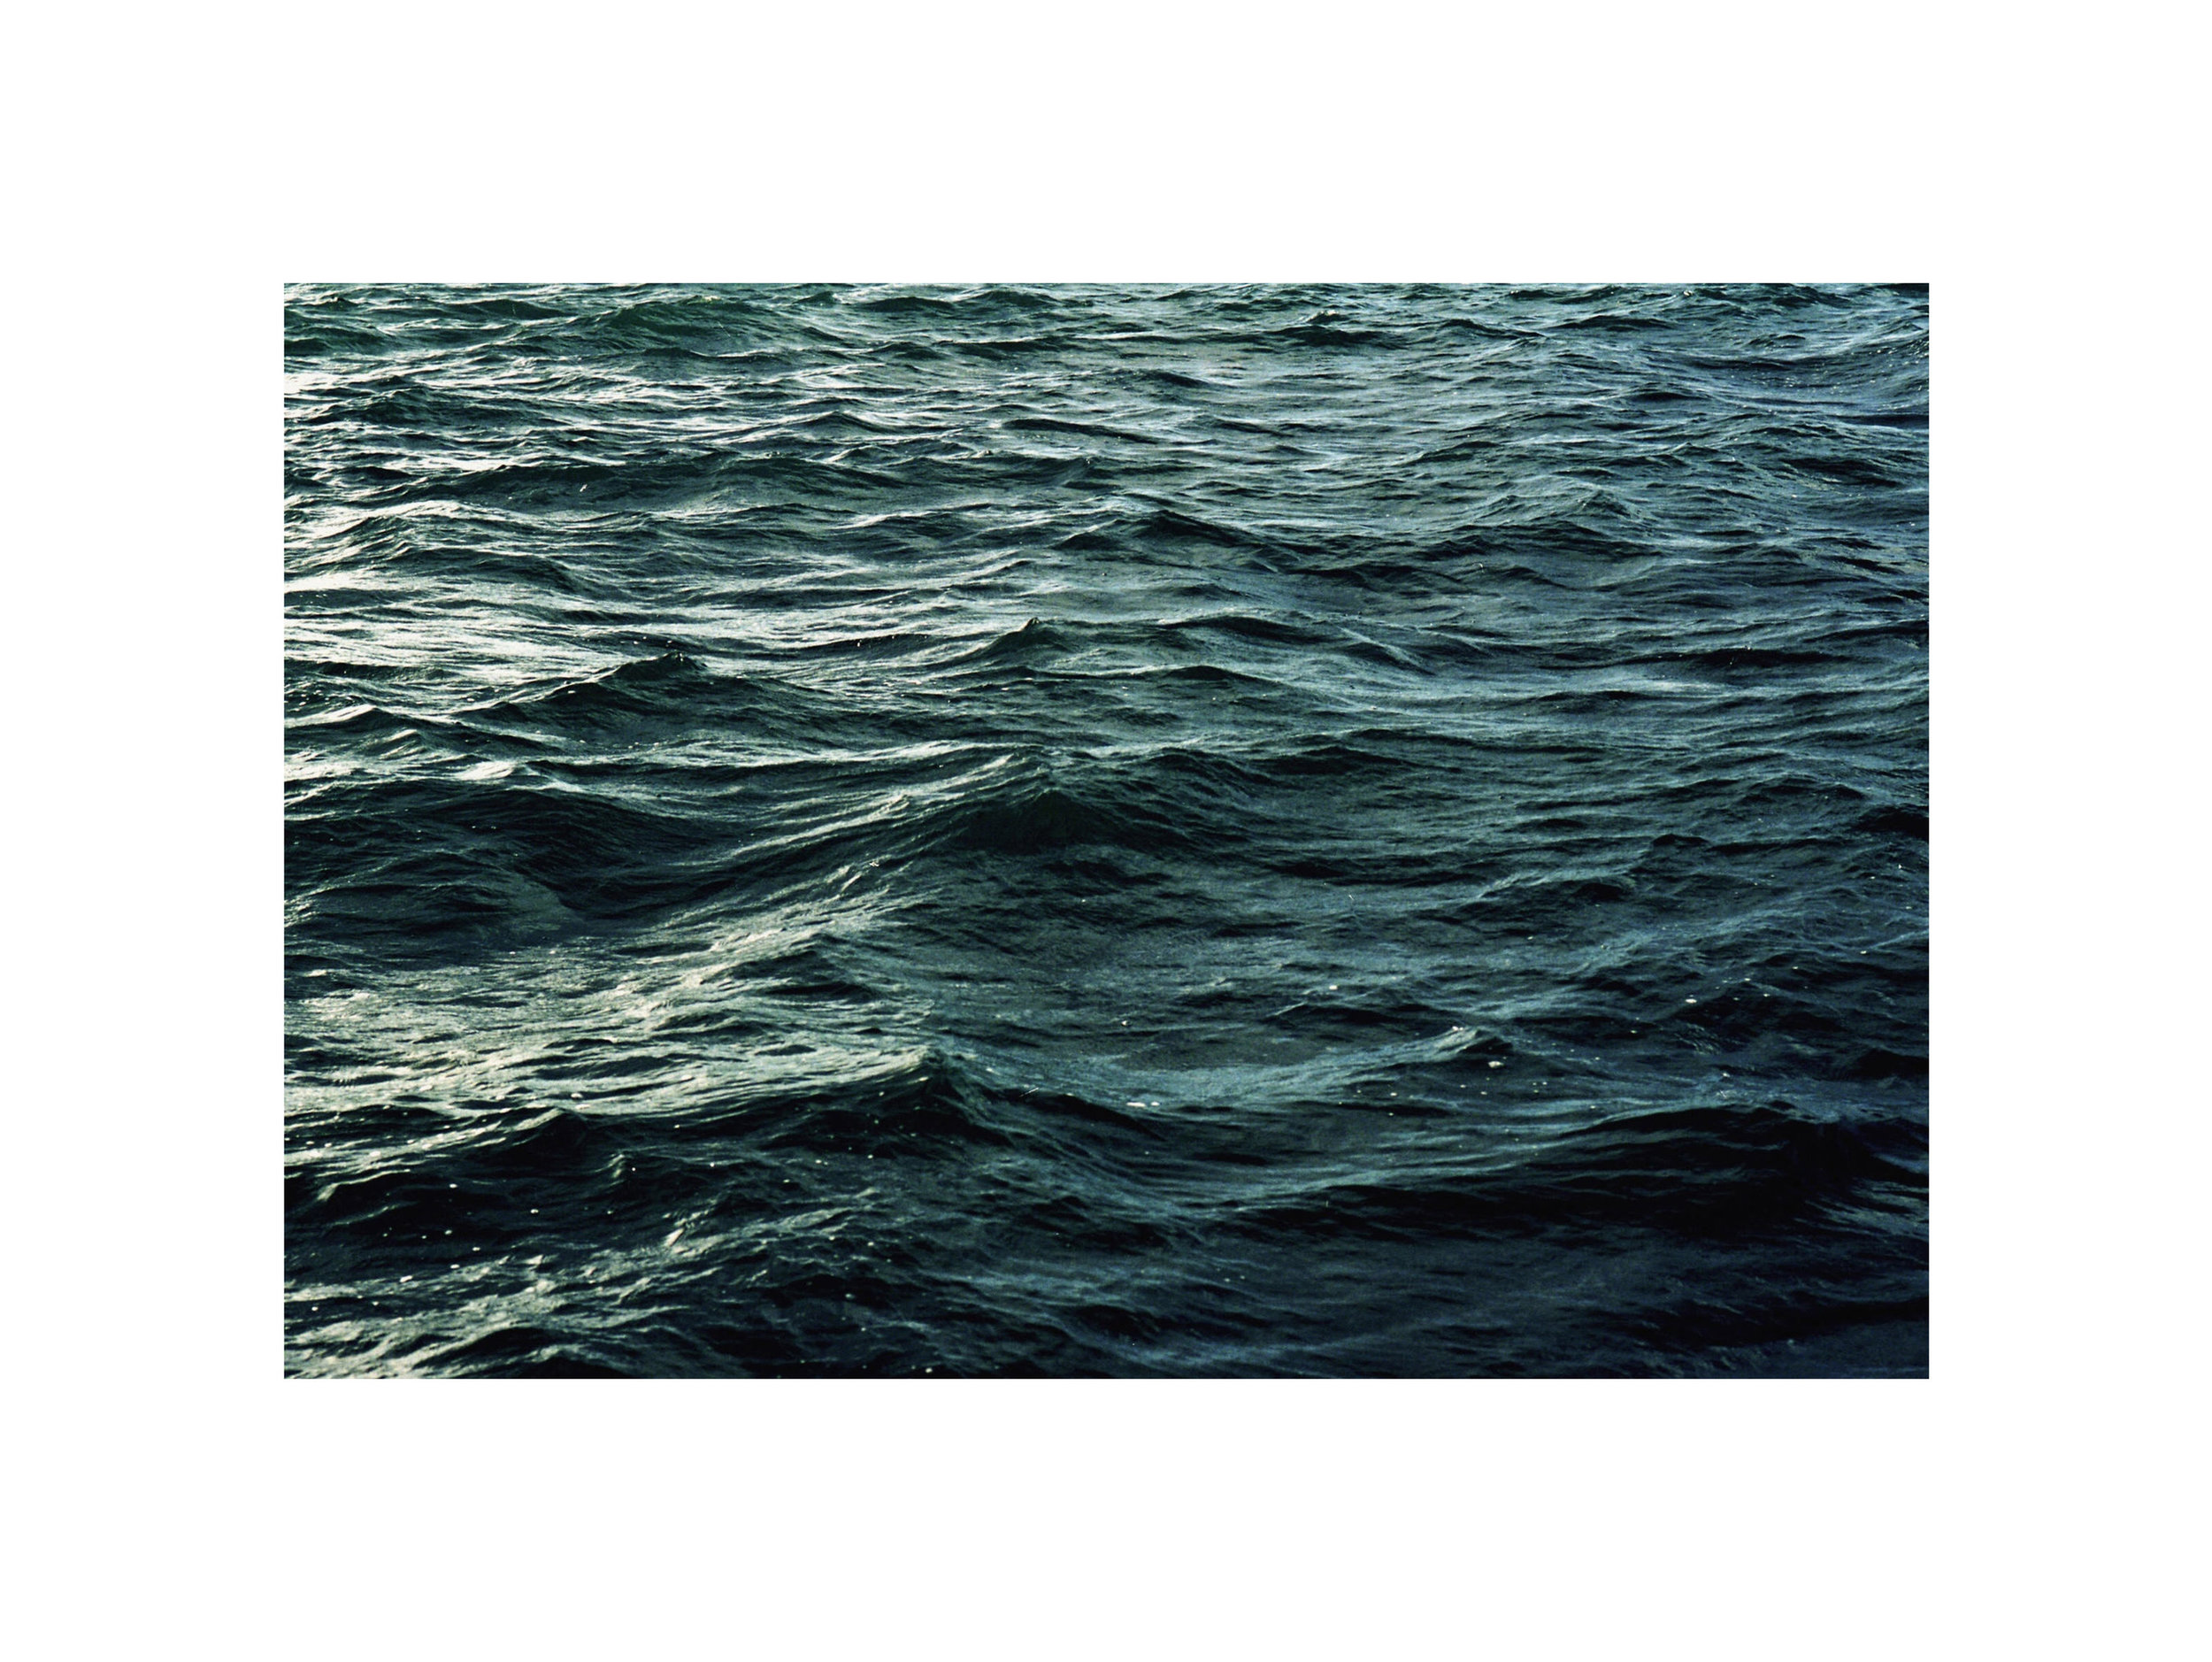 PACIFIC OCEAN, HI 2016